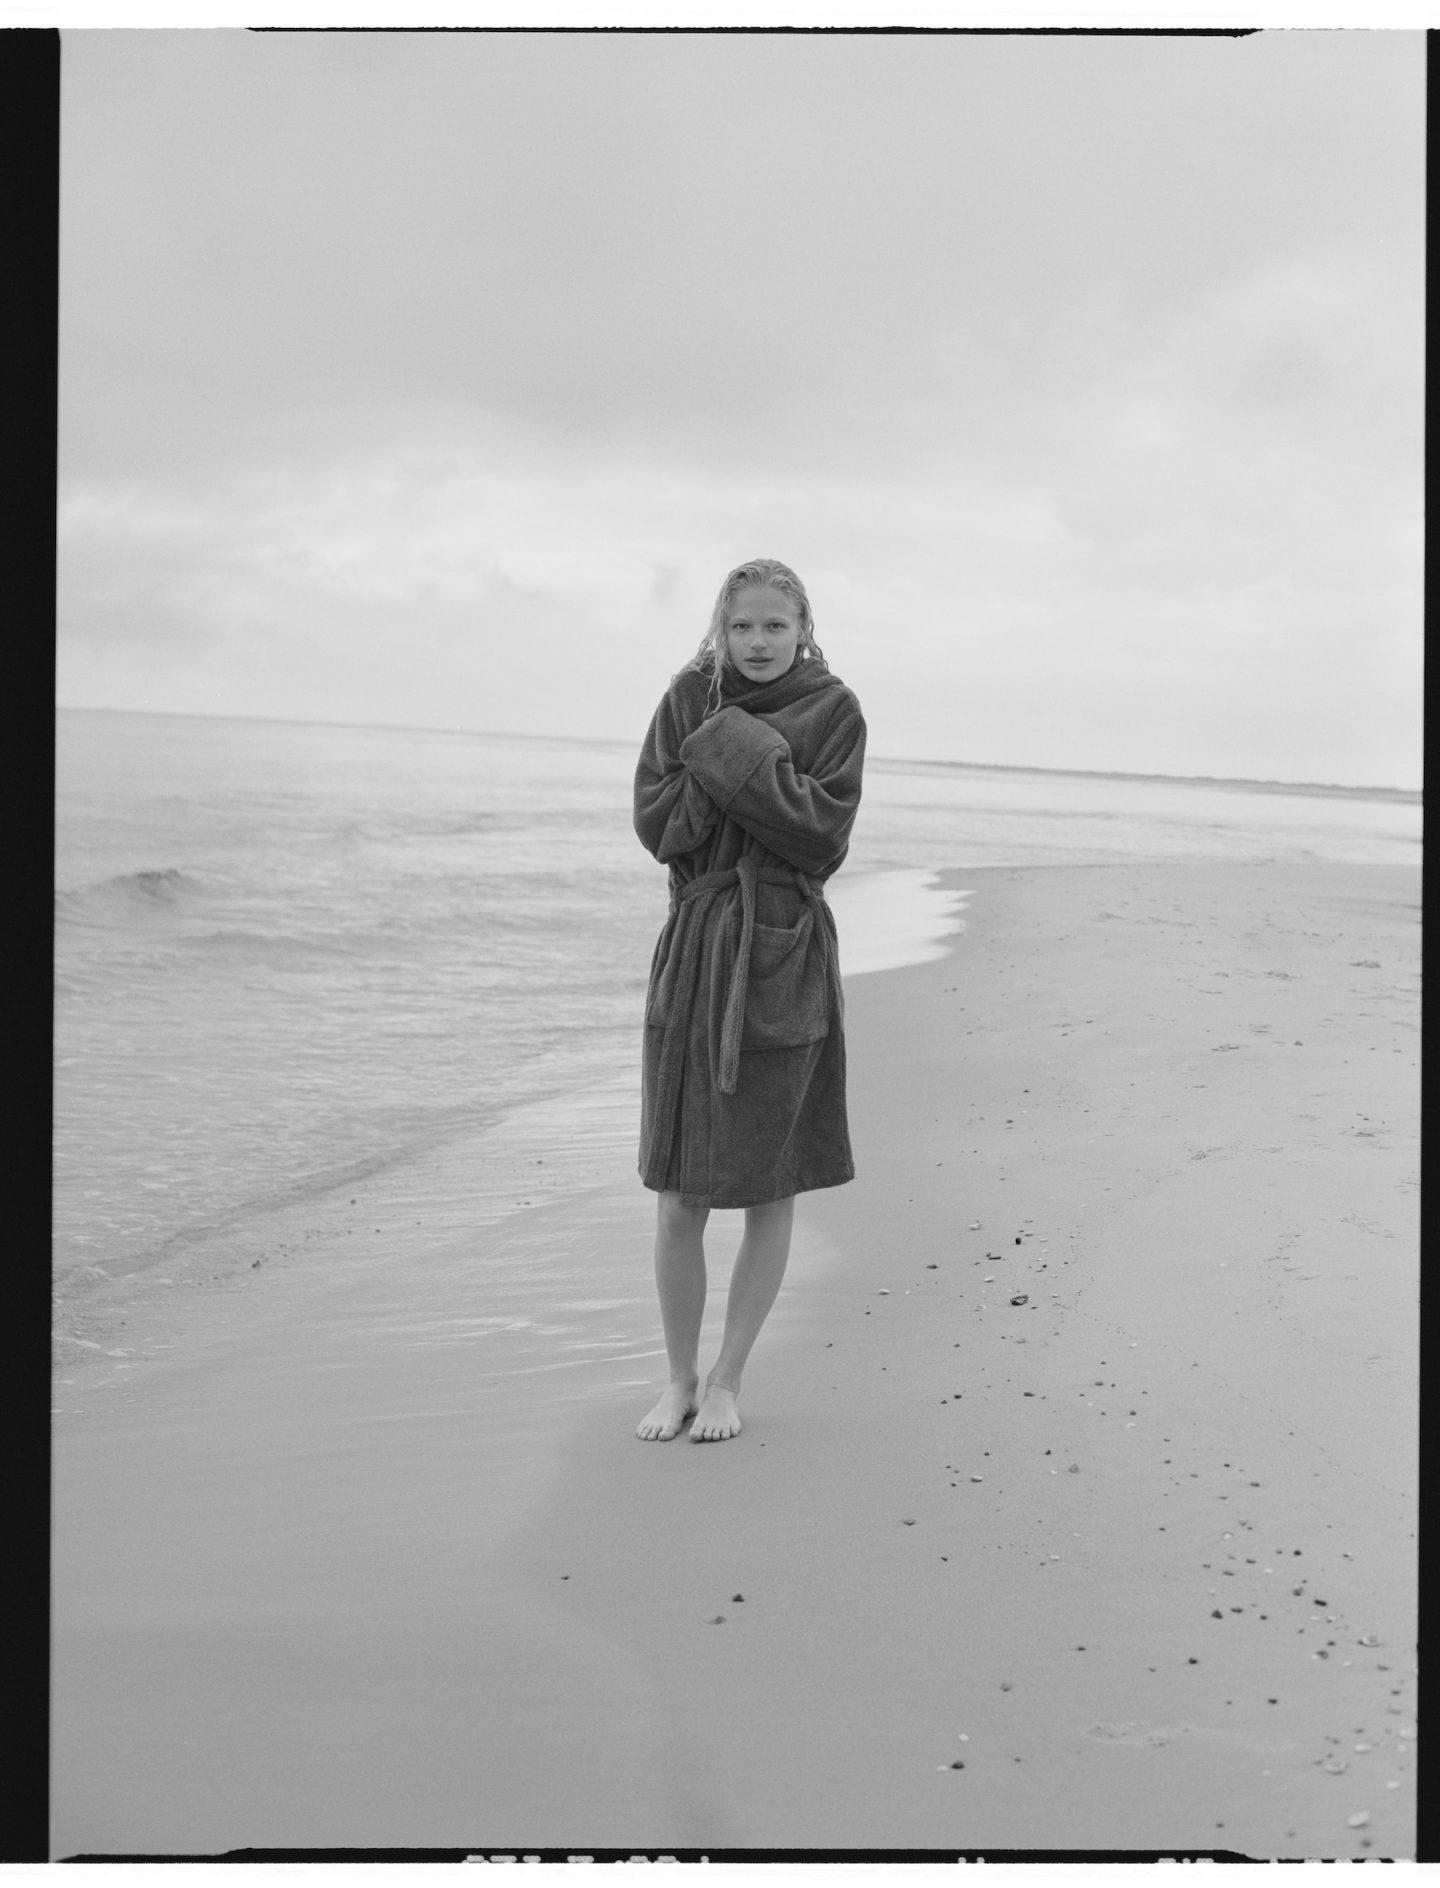 IGNANT-Photography-Tekla-Philip-Messmann-013